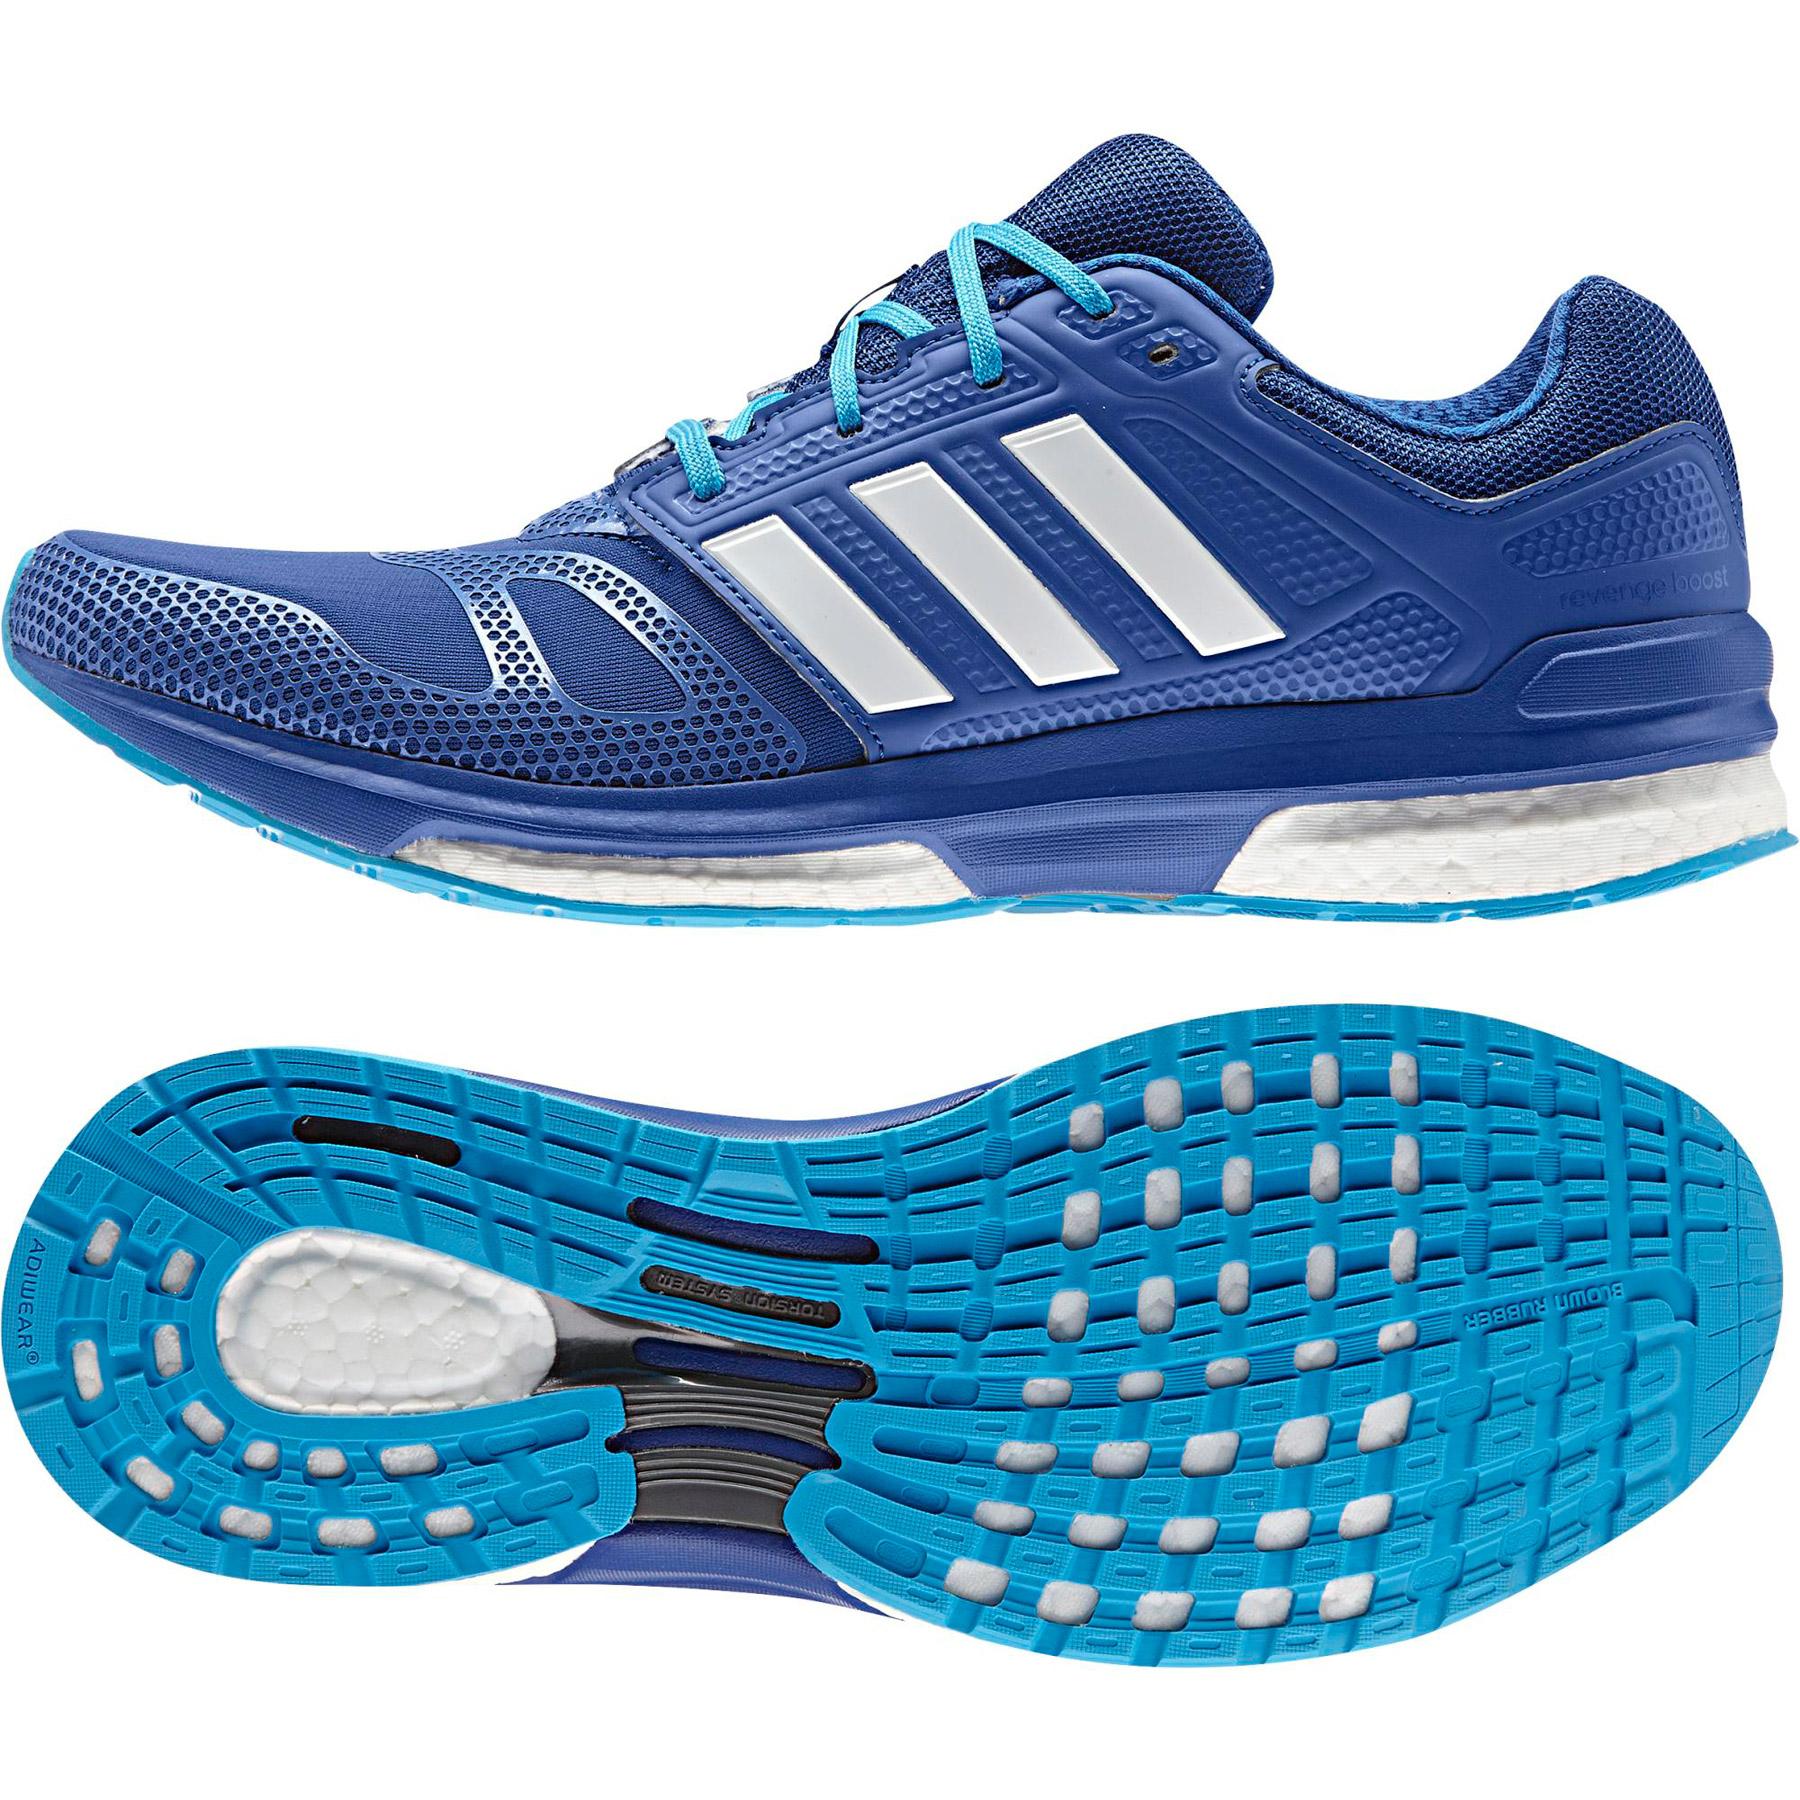 Adidas Revenge Boost 2 TechFit Trainers Royal Blue